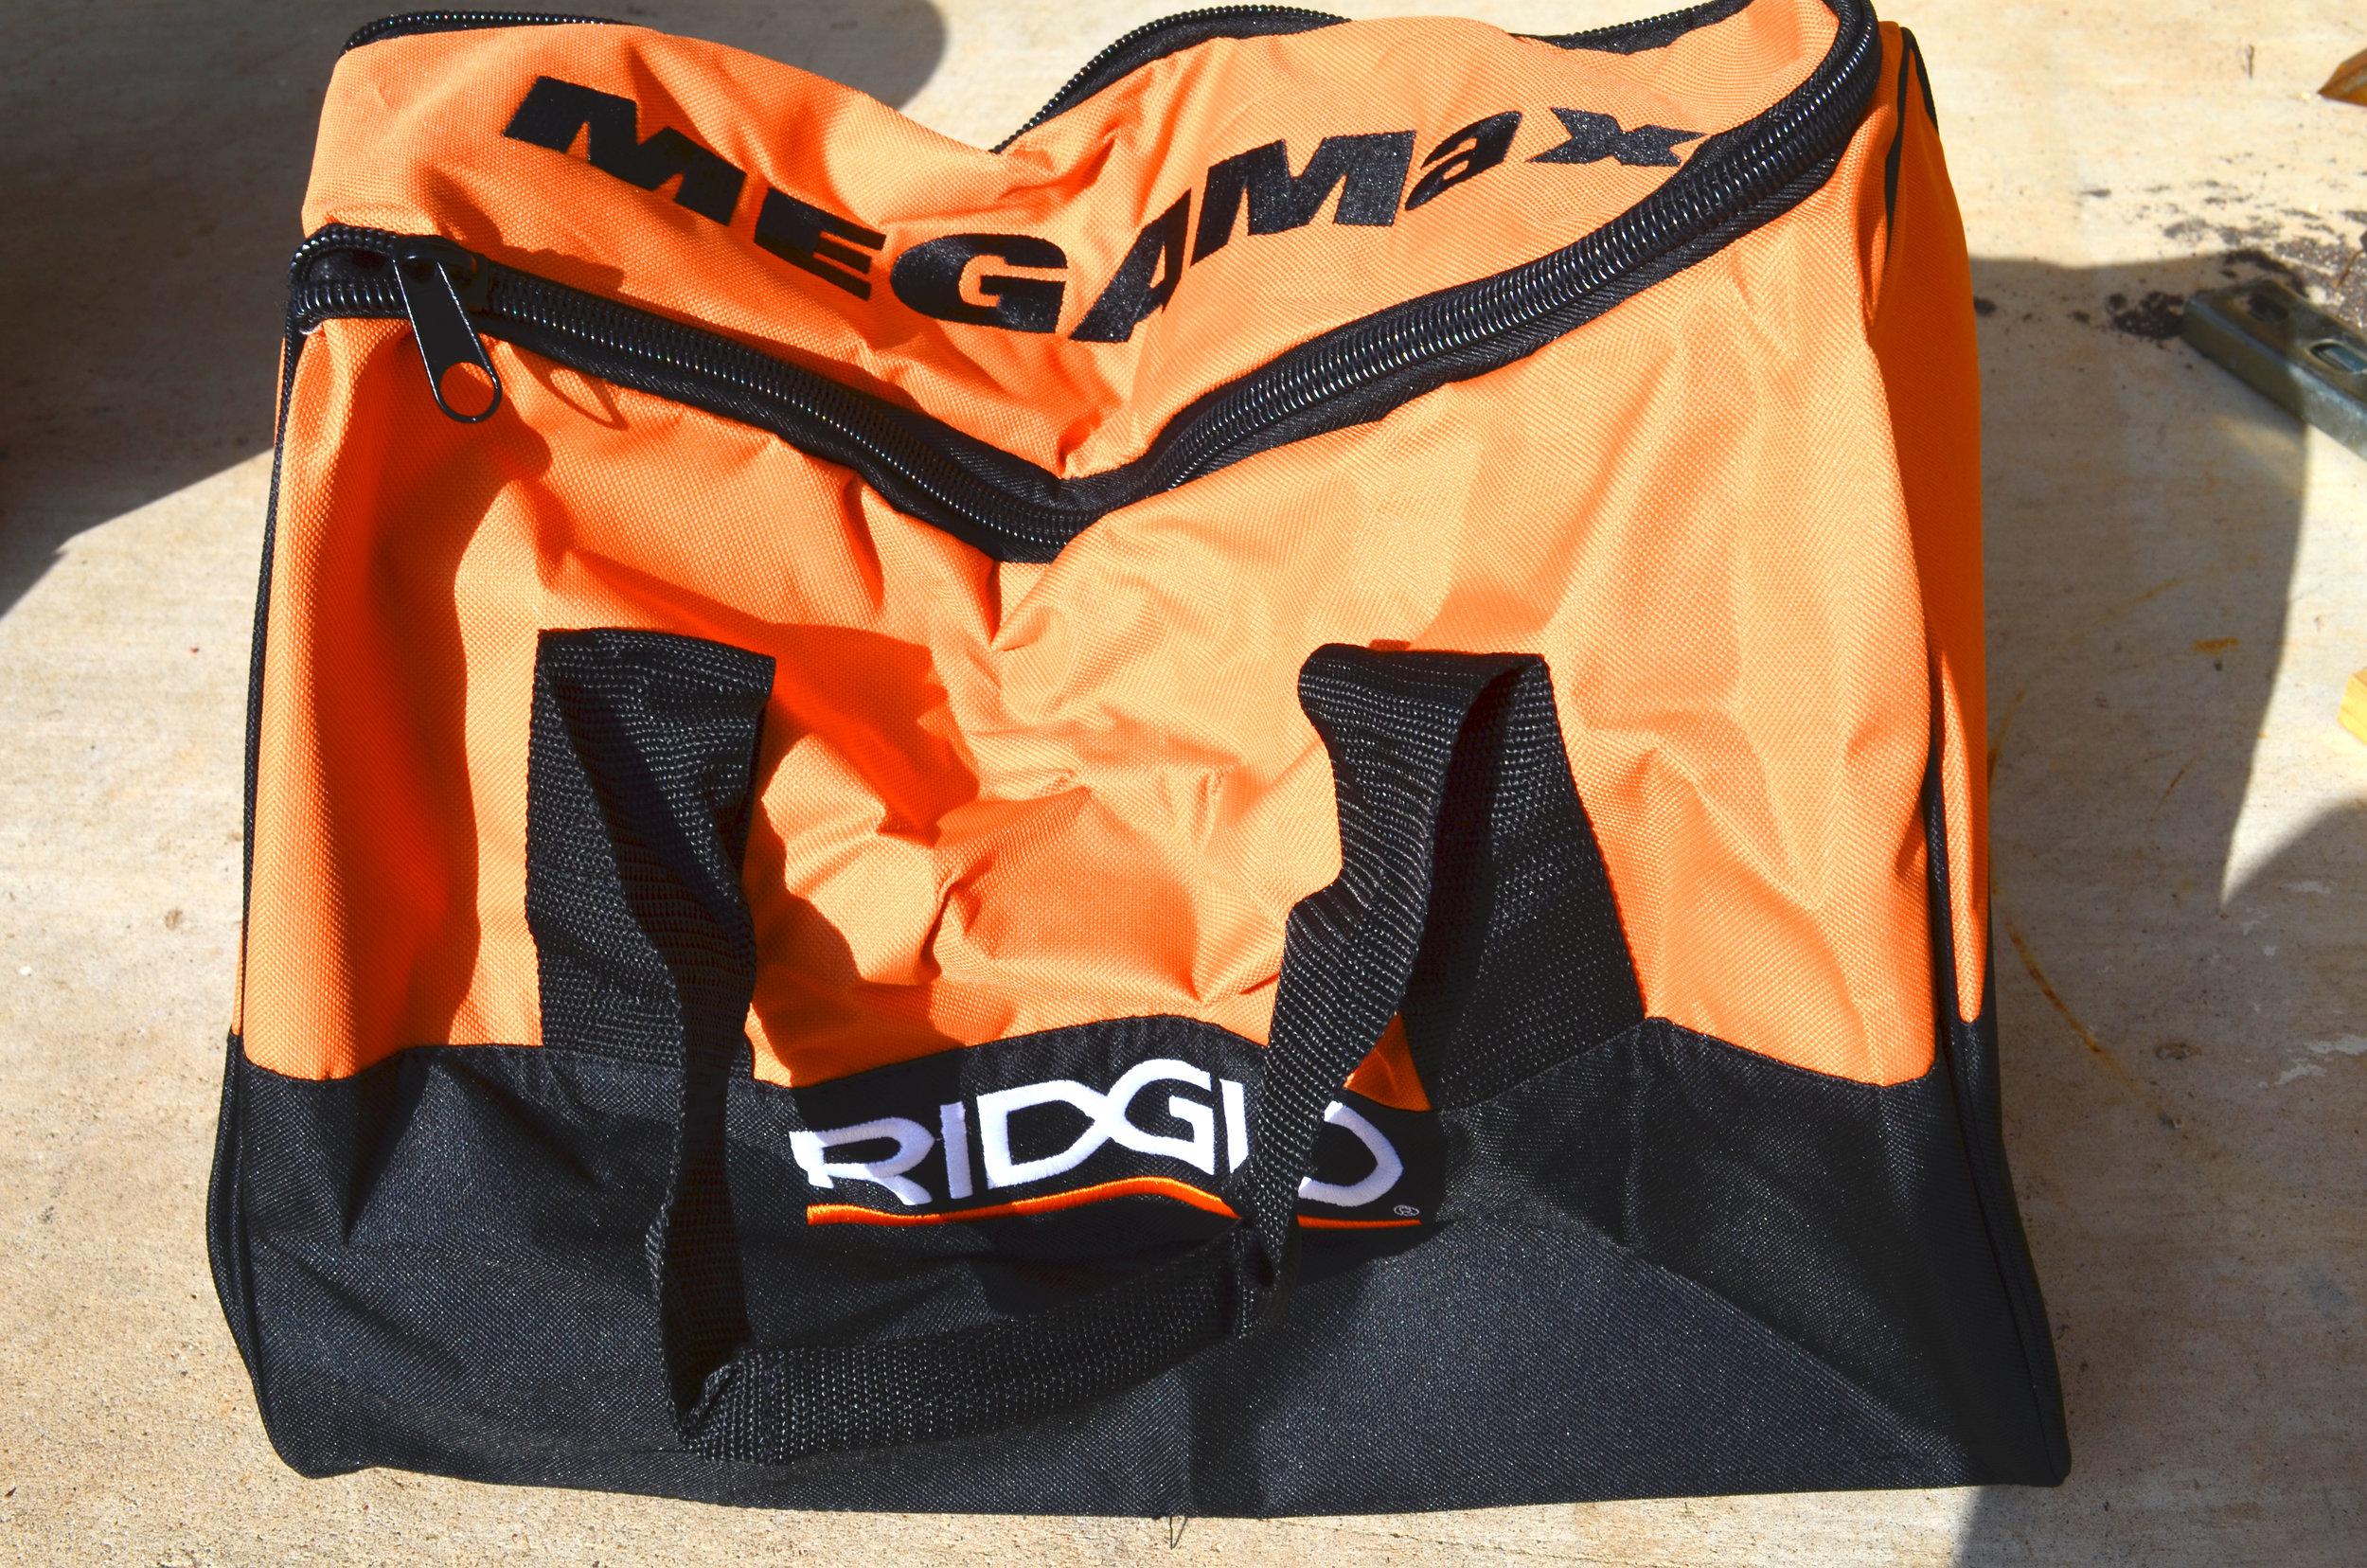 ridgid-megamax-carrying-bag.jpg